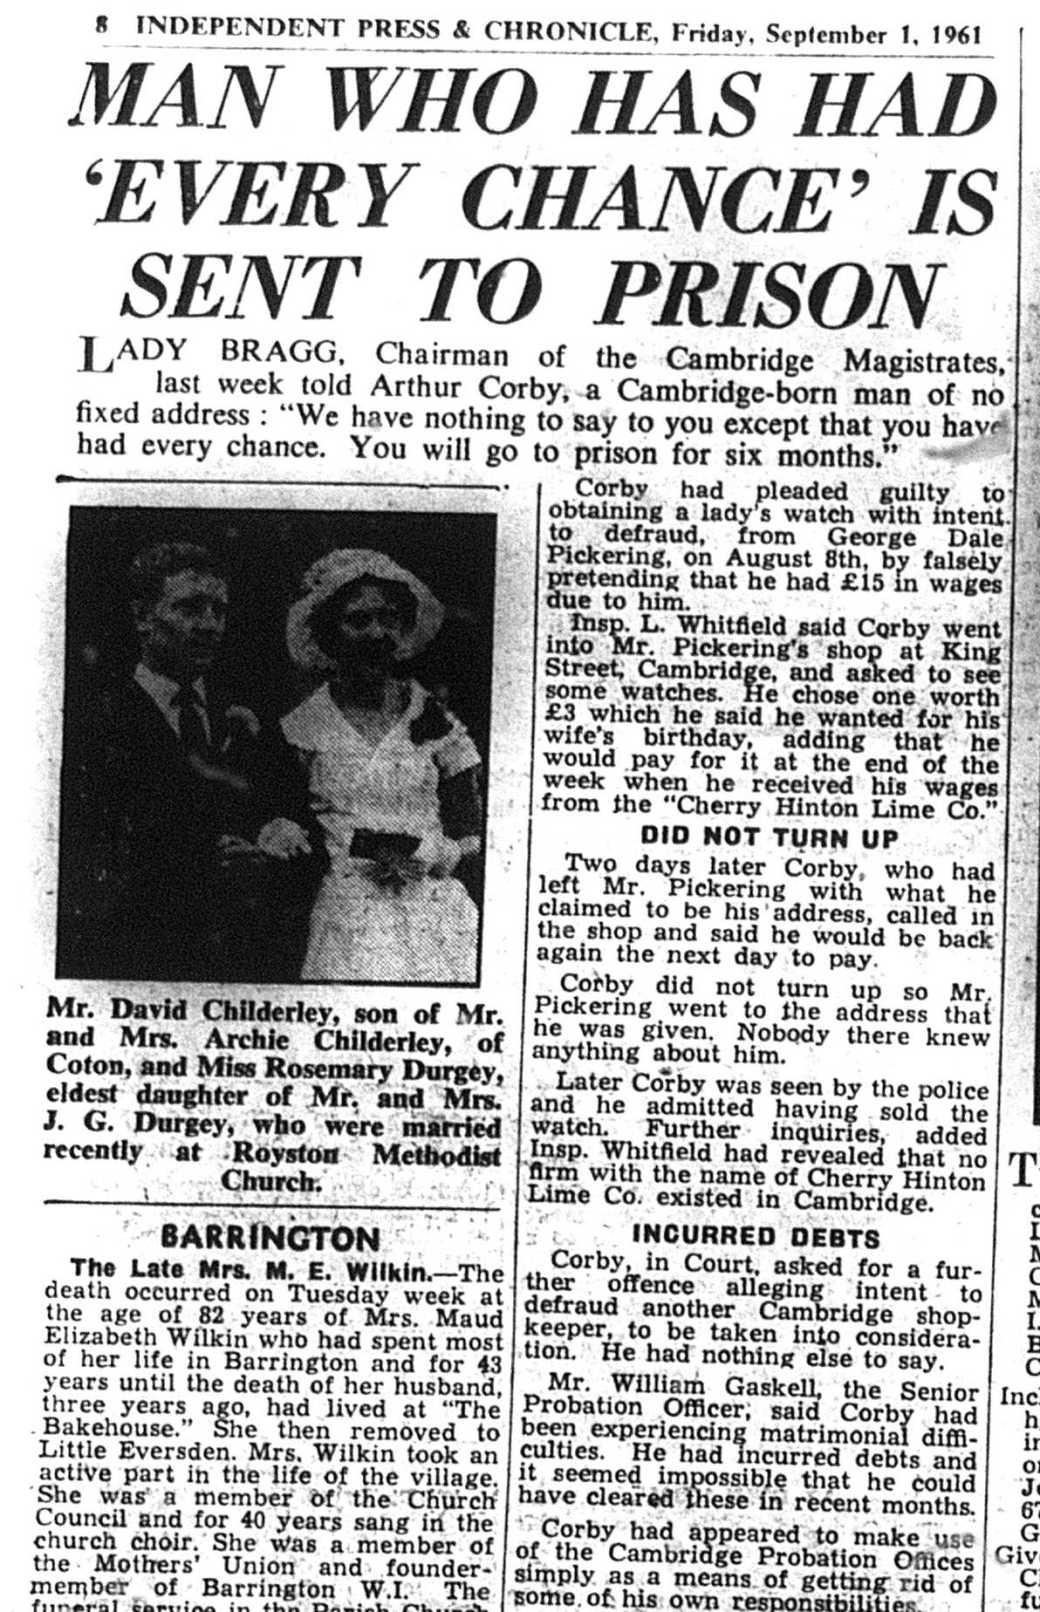 610901 Lady Bragg jails scumball